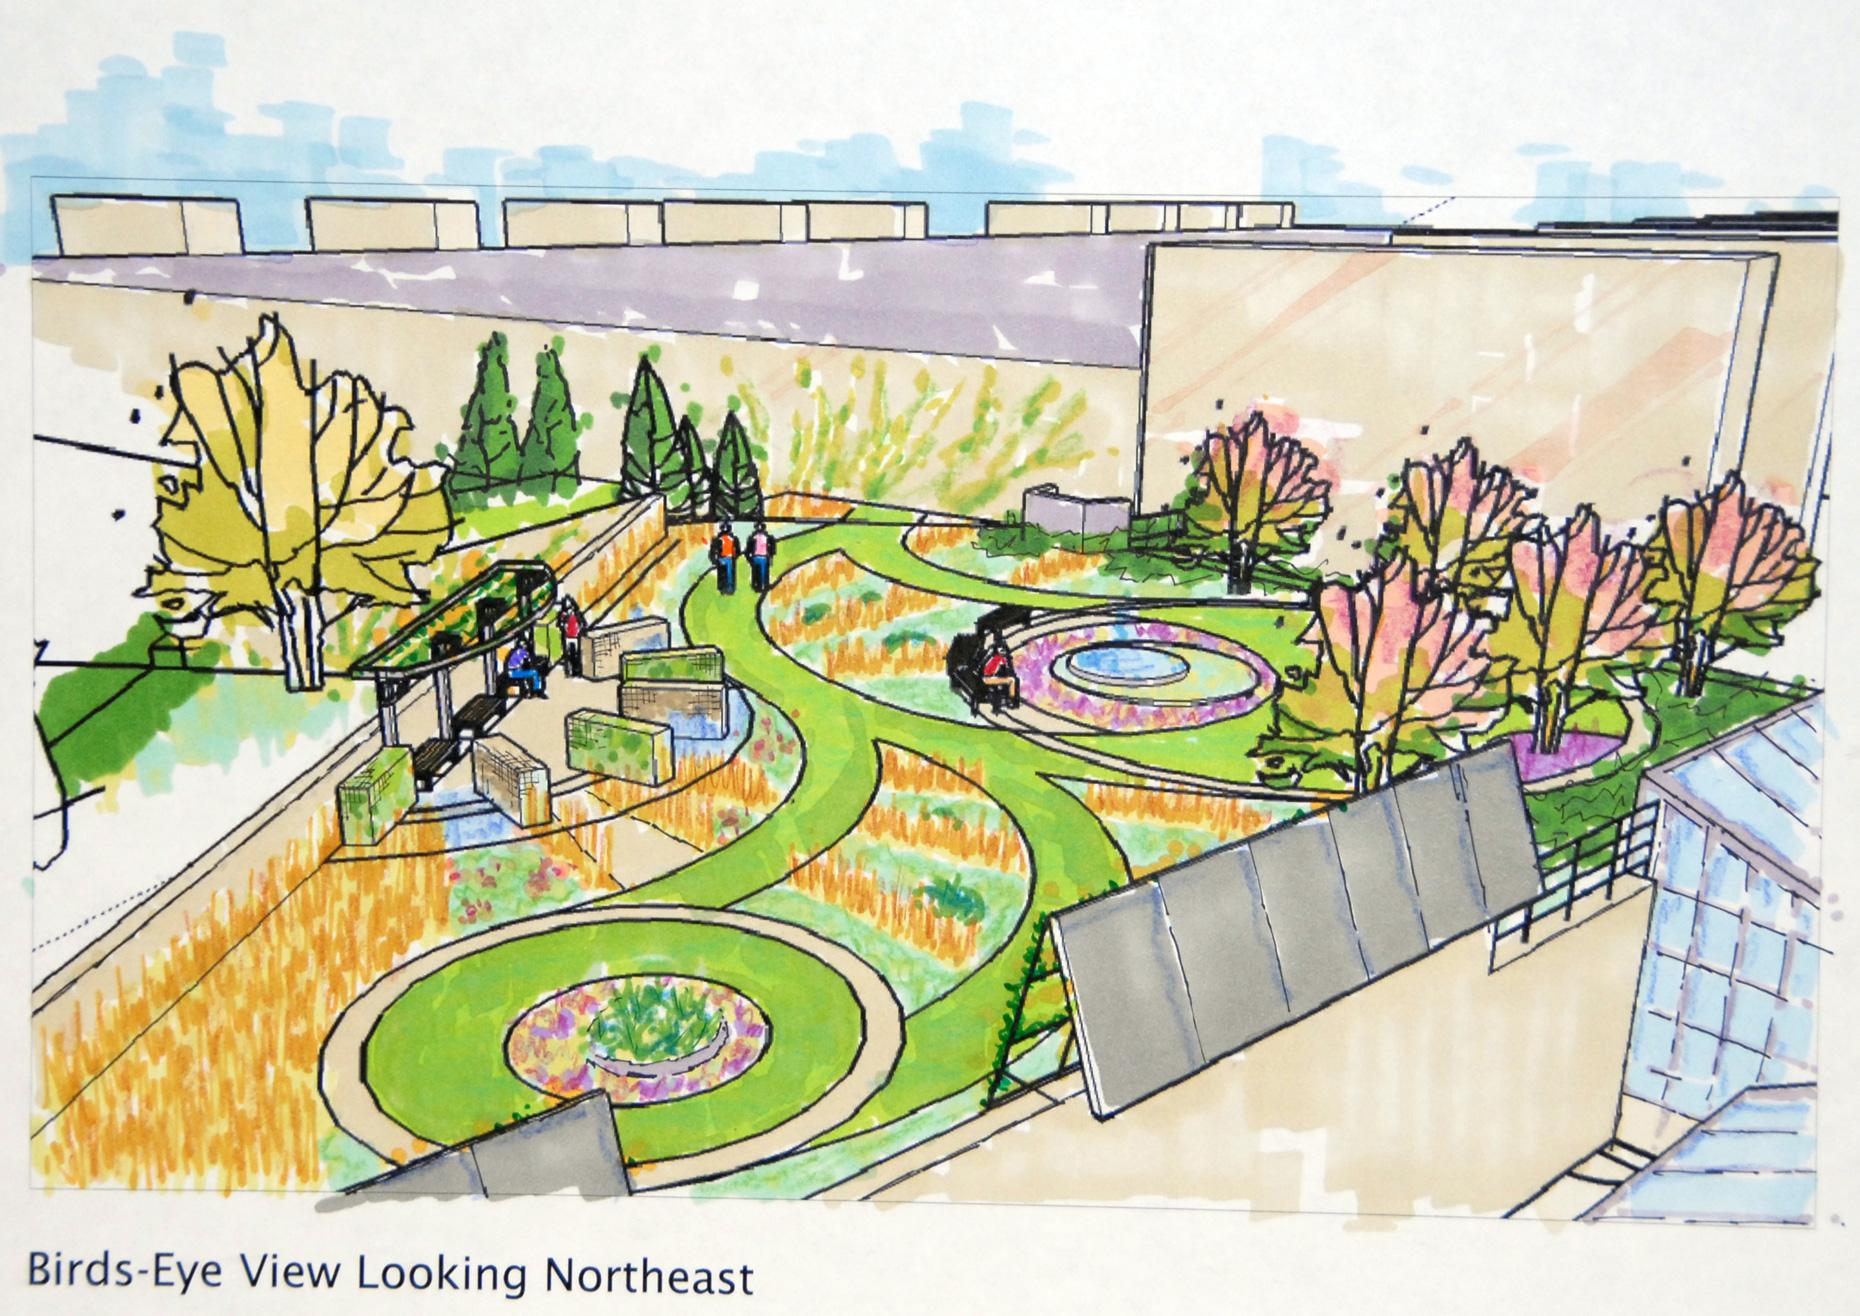 Peaceful Prairies Amp Gardens Above Dctc News